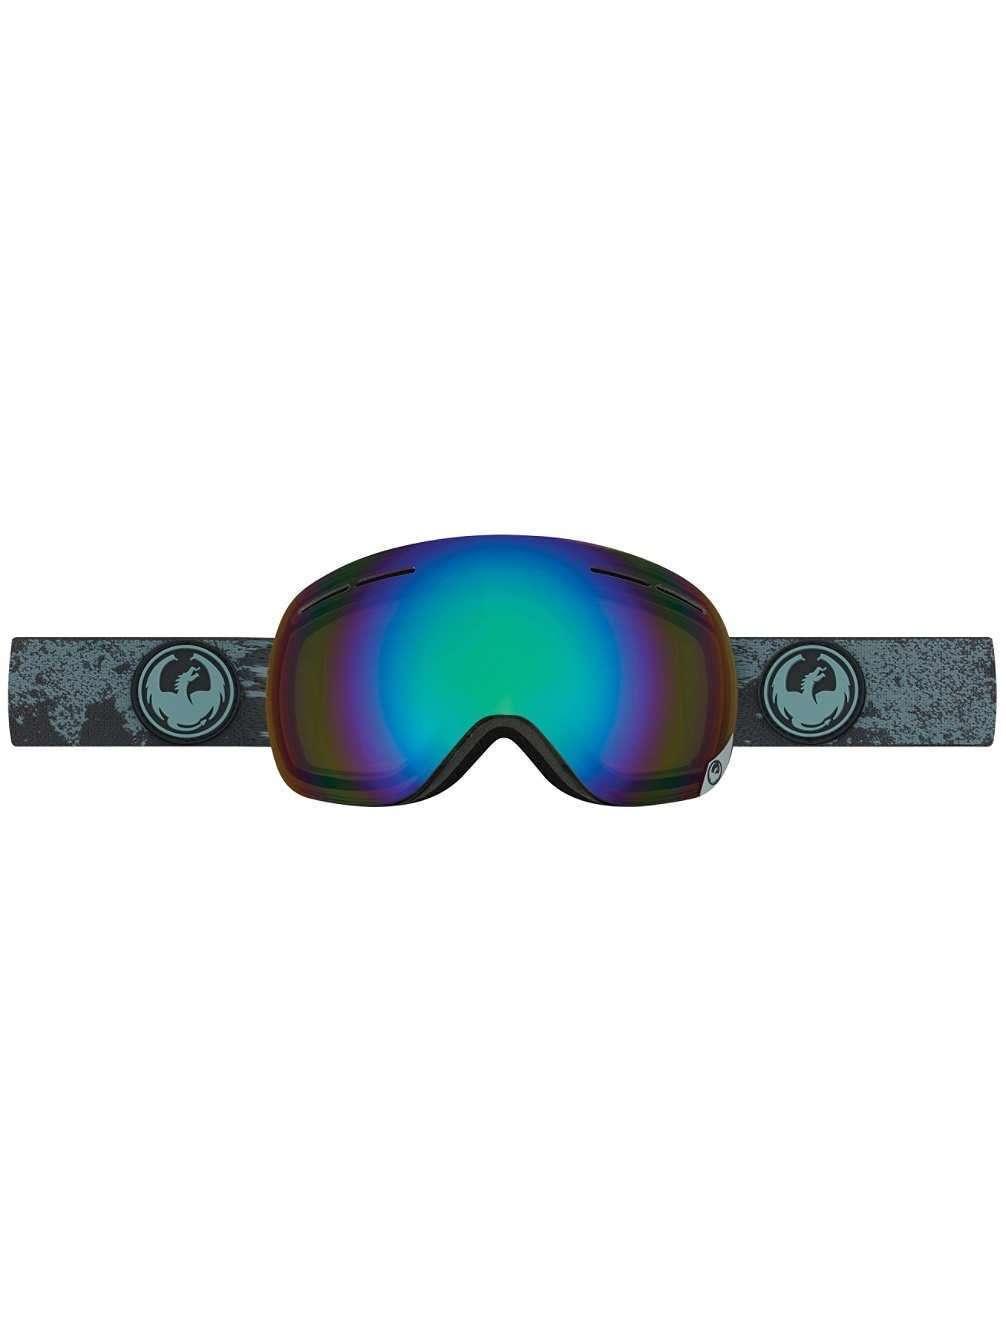 Dragon Alliance X1s Ski Goggle Mason Gey flash green Polarized  NEW